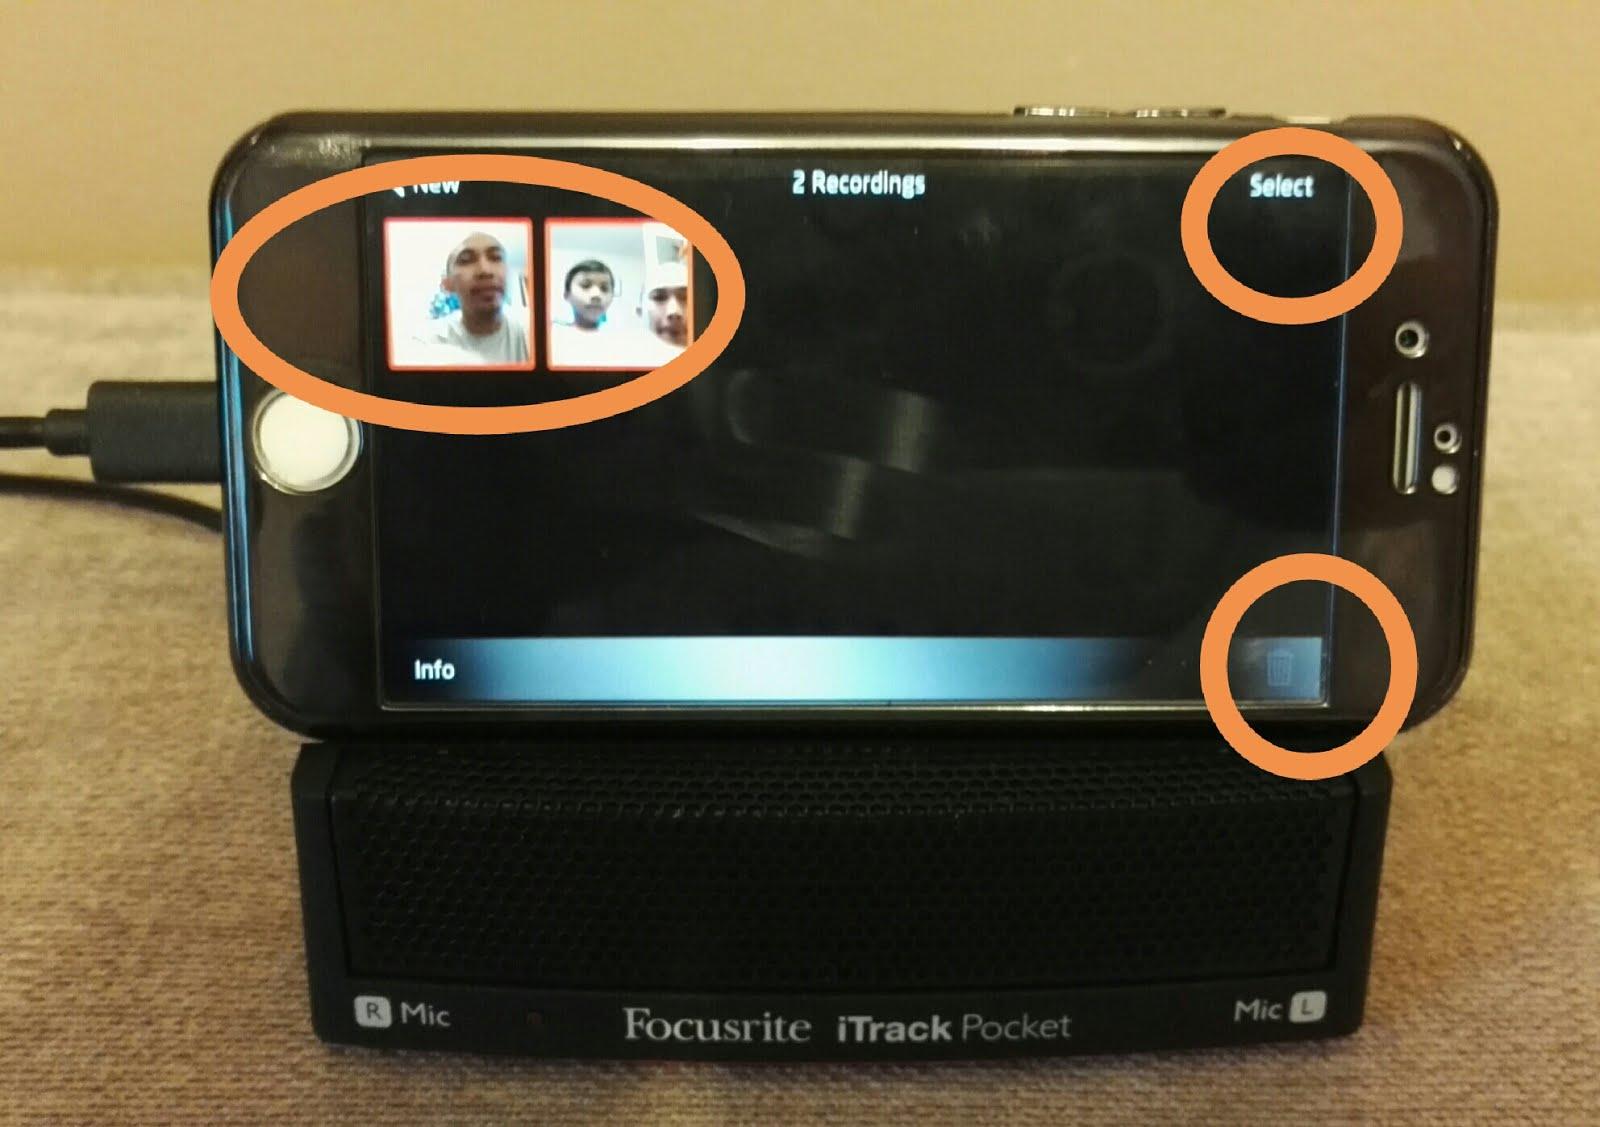 I am homebased: How to use iTrack Pocket